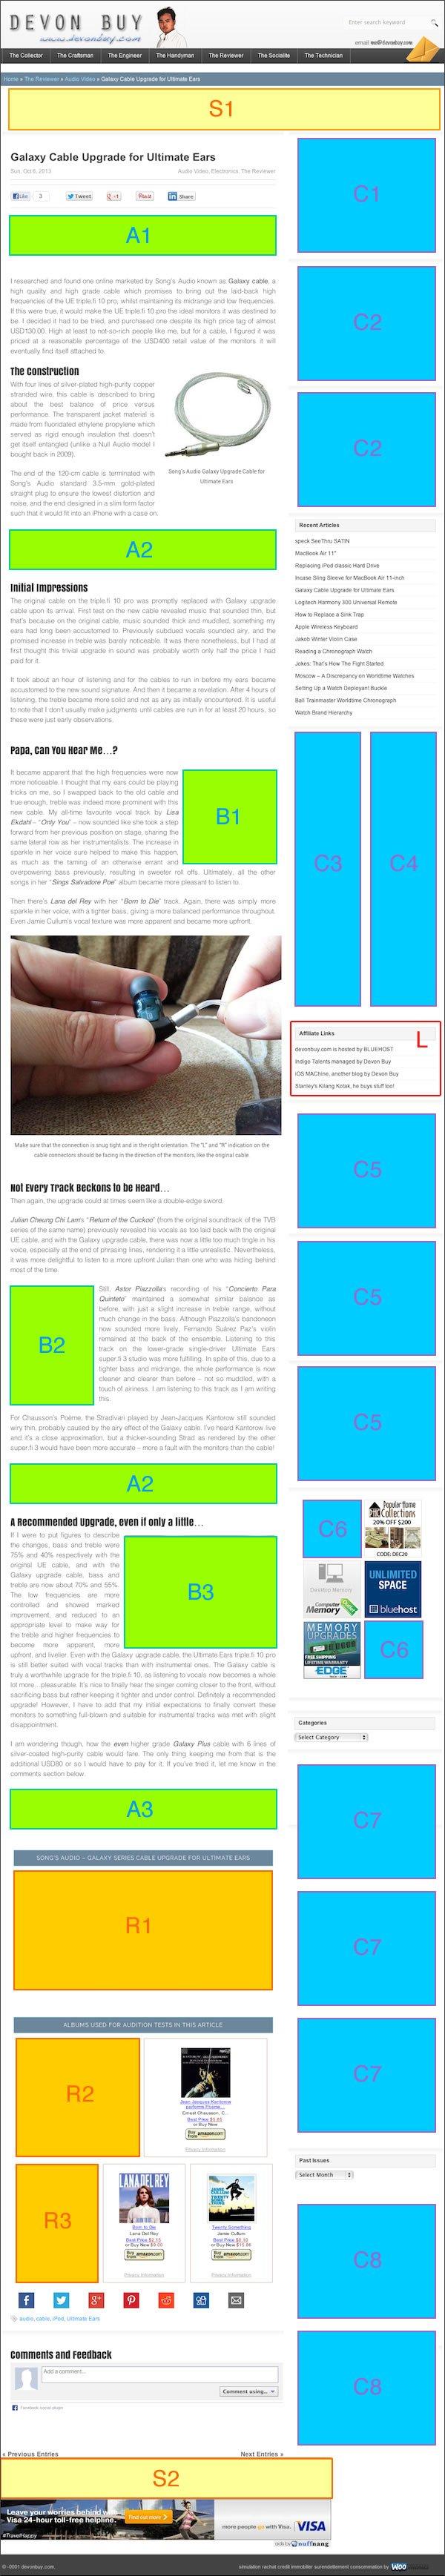 blog_ads